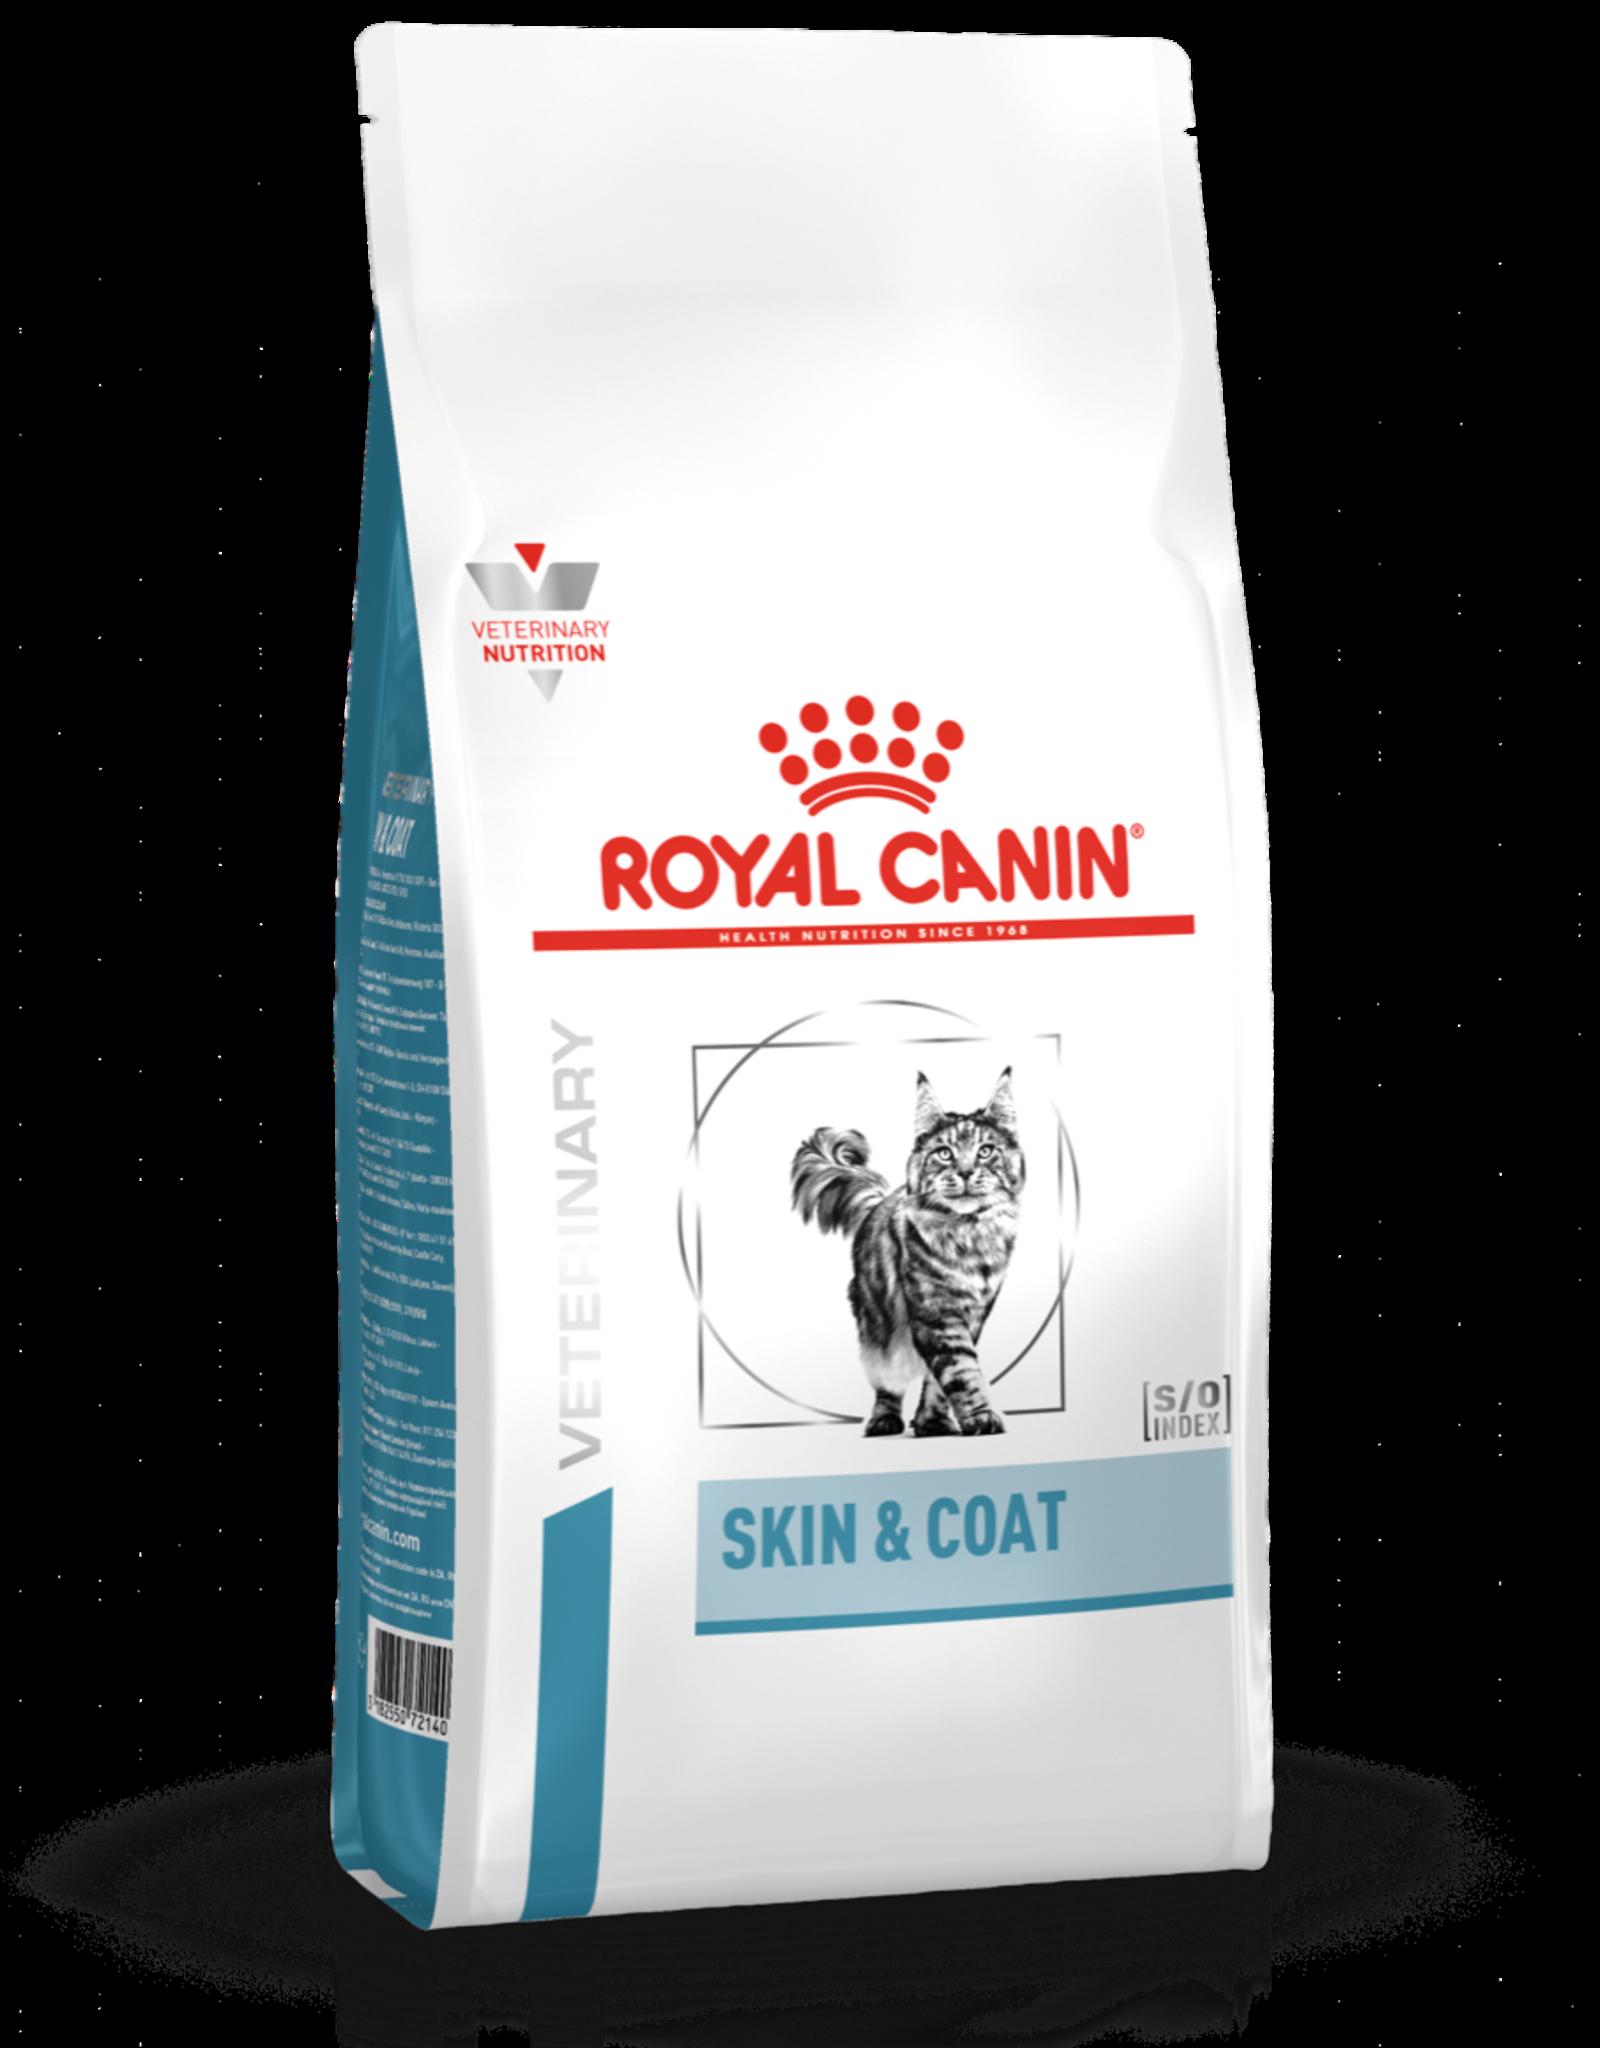 Royal Canin Royal Canin Skin & Coat Kat 1,5kg